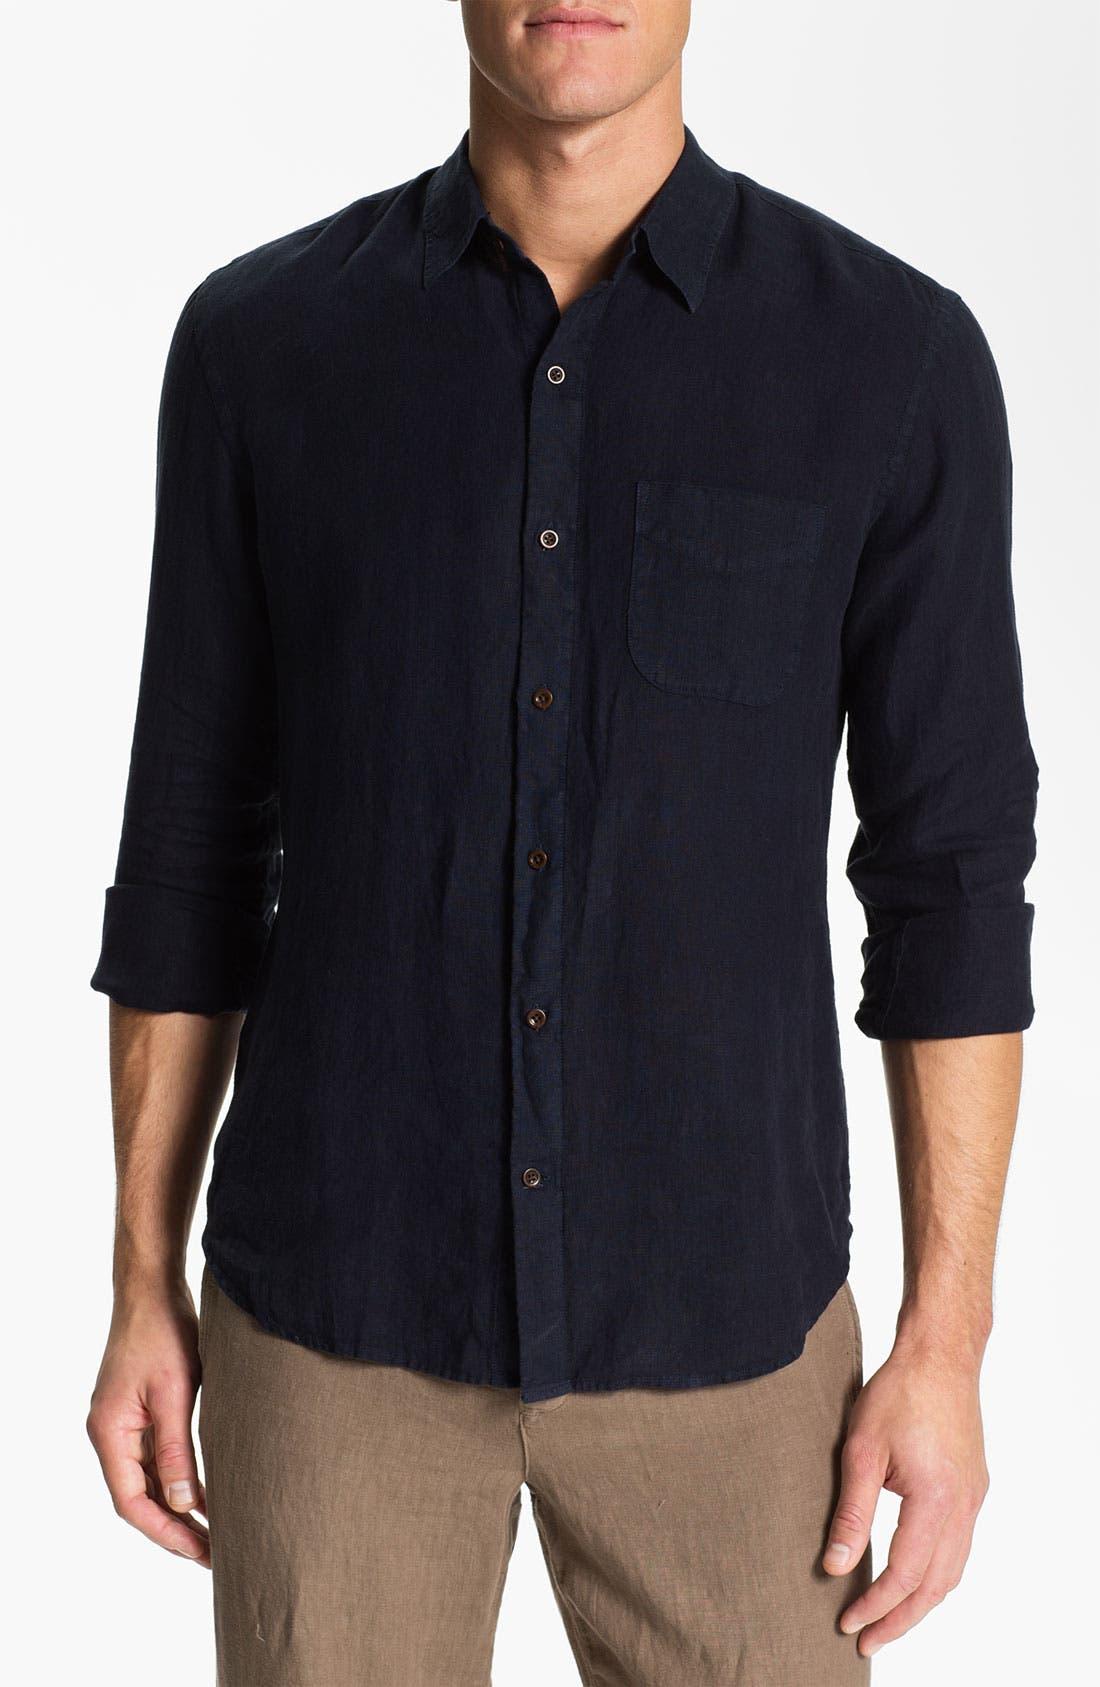 Alternate Image 1 Selected - Vince Woven Linen Shirt